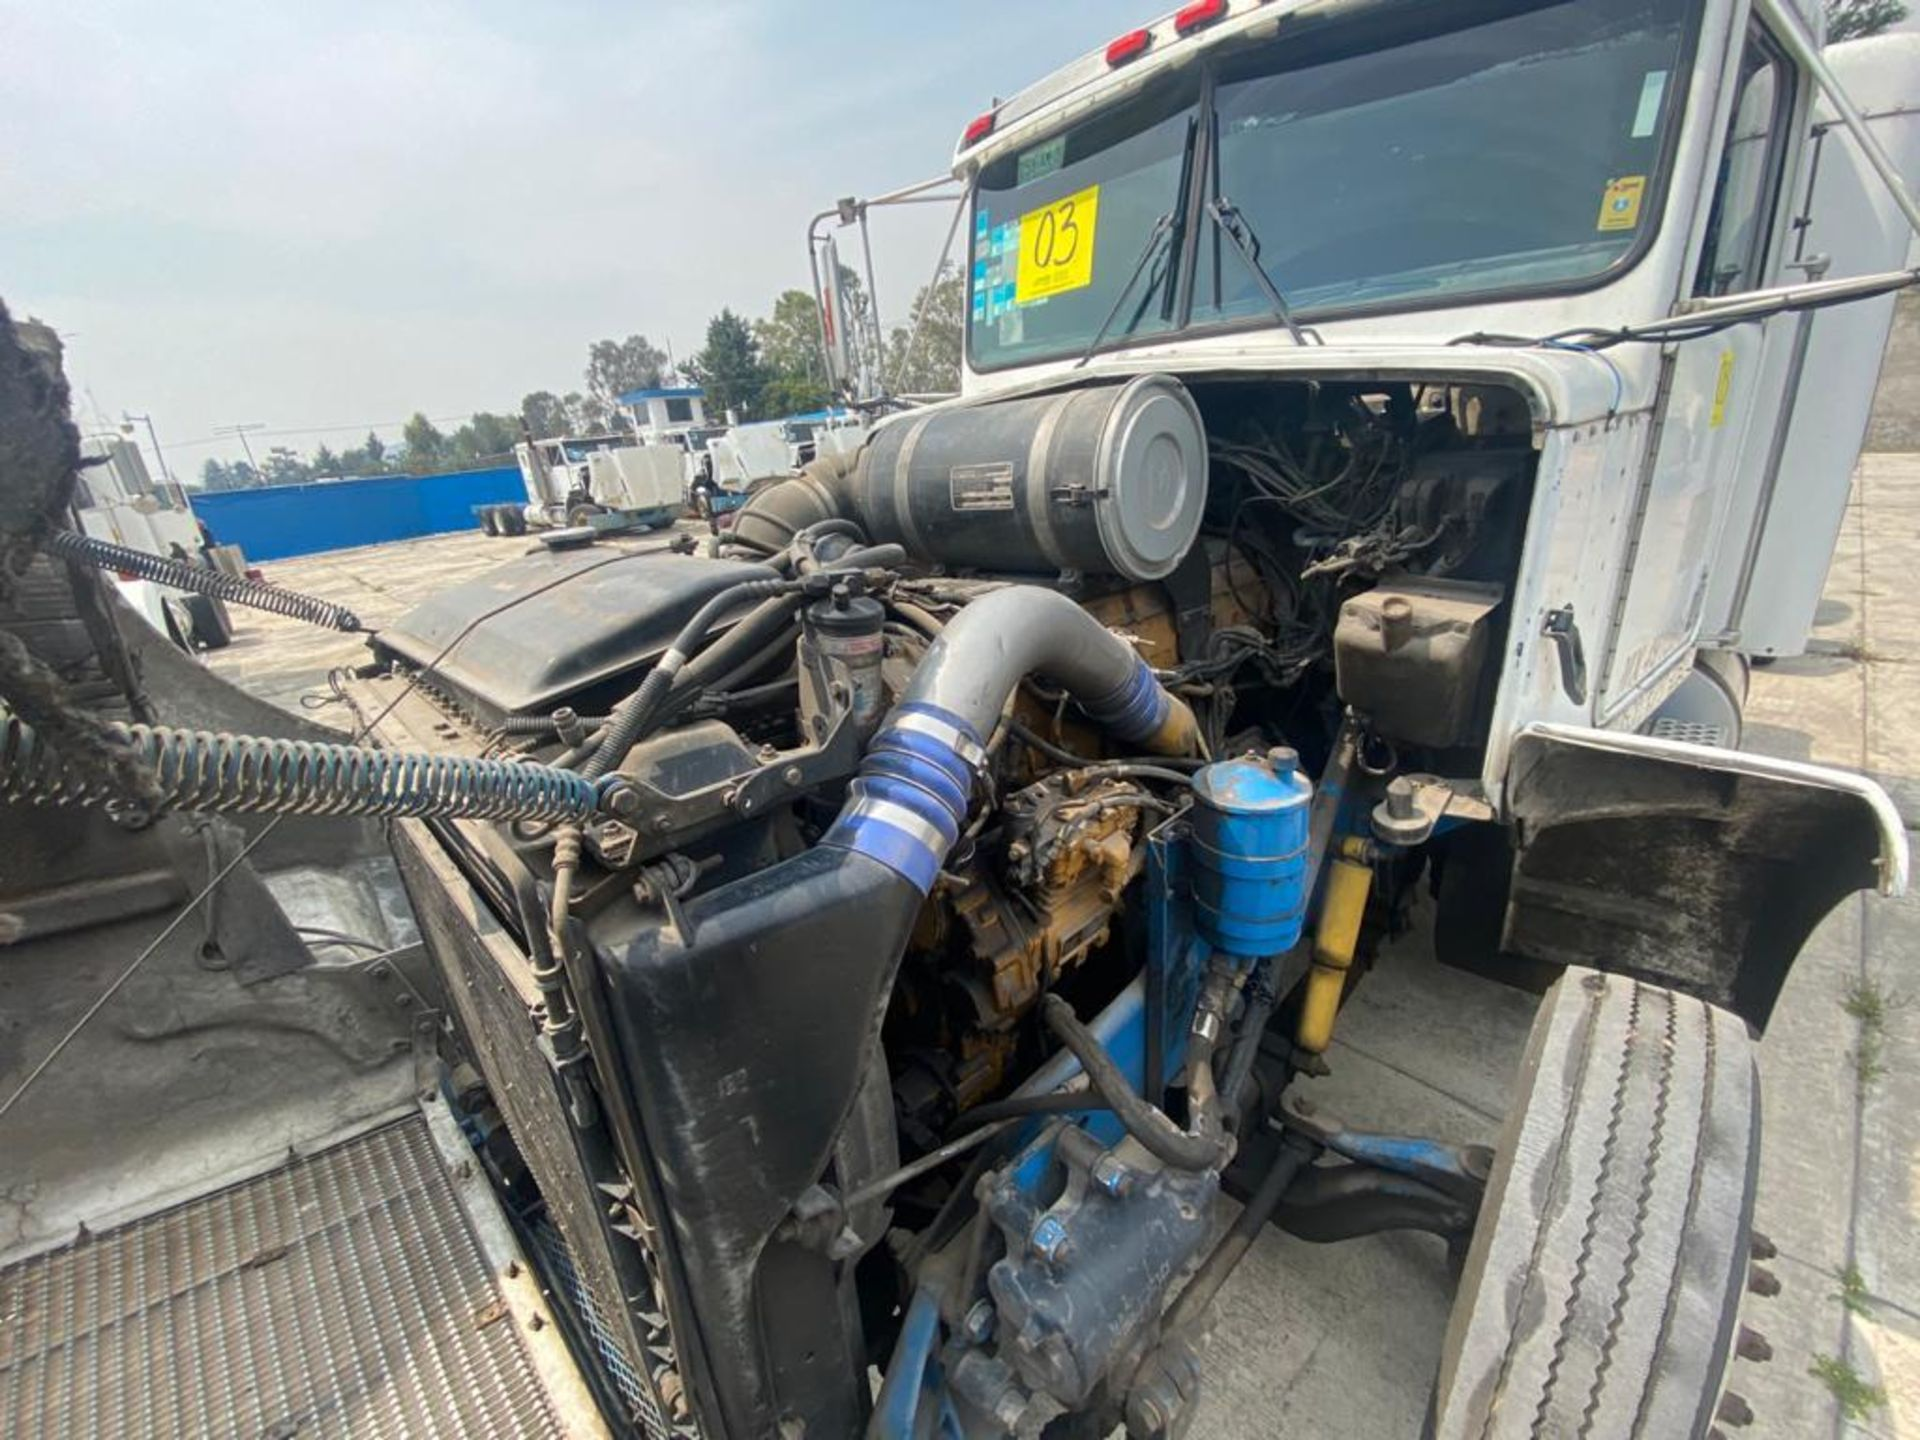 1999 Kenworth Sleeper truck tractor, standard transmission of 18 speeds - Image 52 of 62